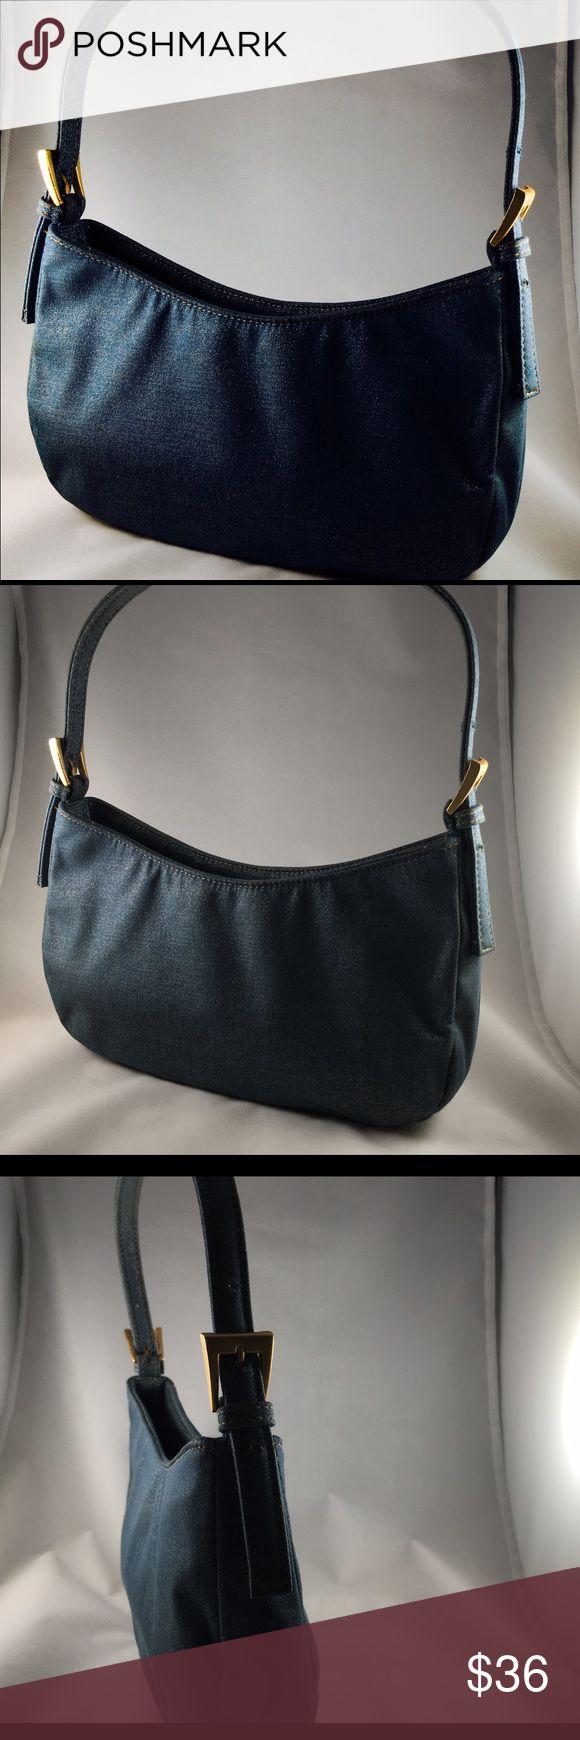 A/X Armani Exchange handbag in shinny Denim Rare A/X Armani Exchange handbag in shinny Denim. Great condition. No trades A/X Armani Exchange Bags Mini Bags